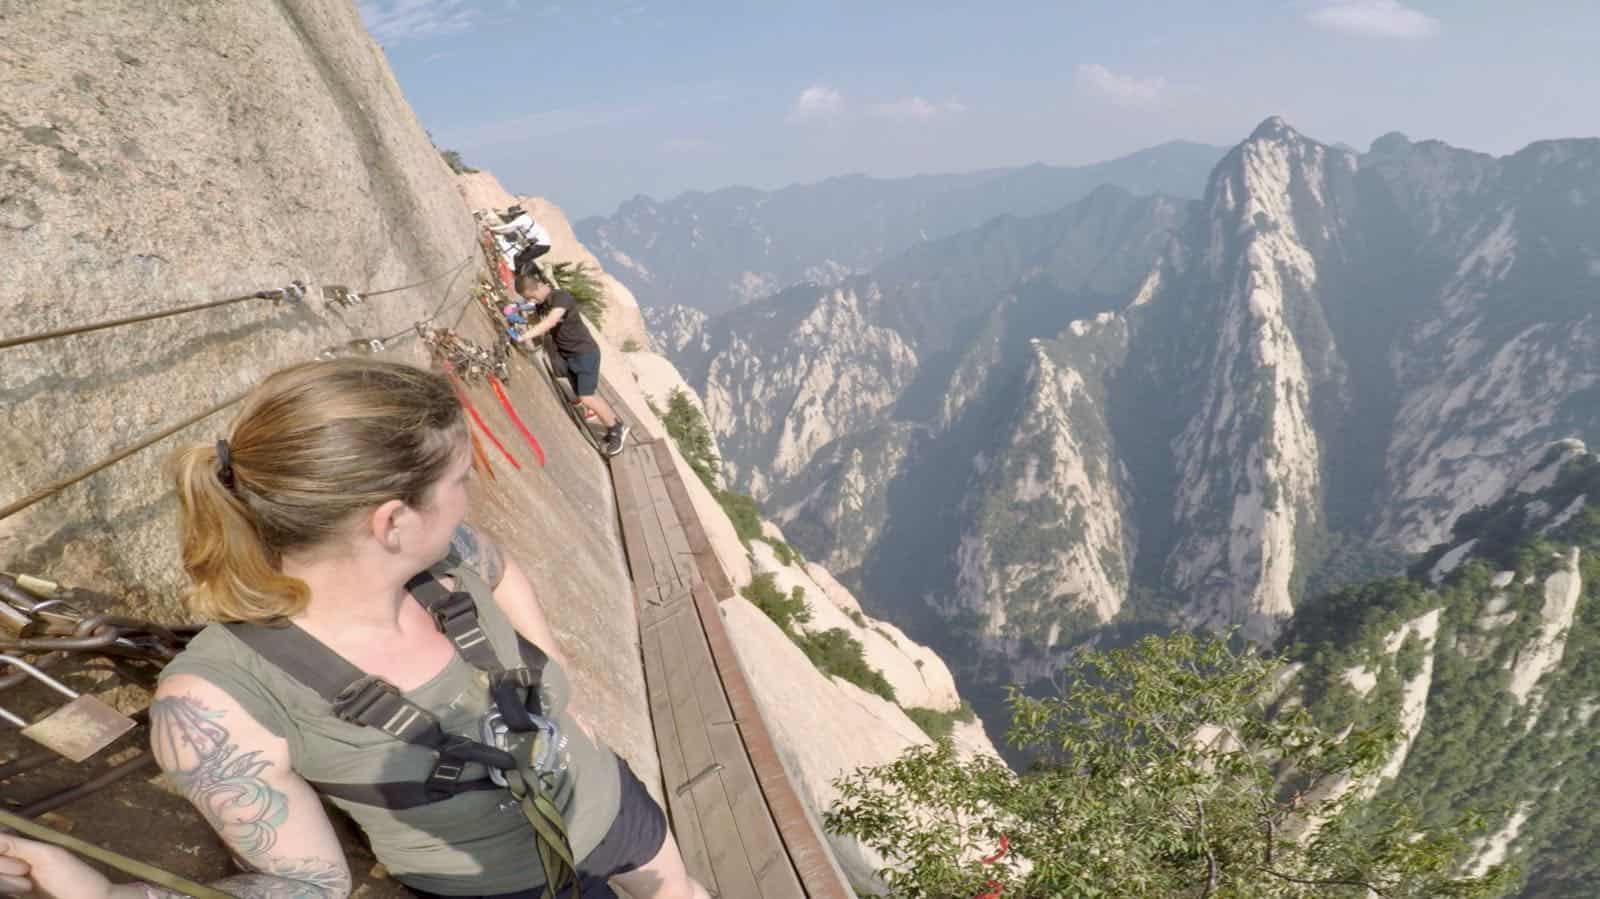 Hannah Hua Shan mountain betternotstop China